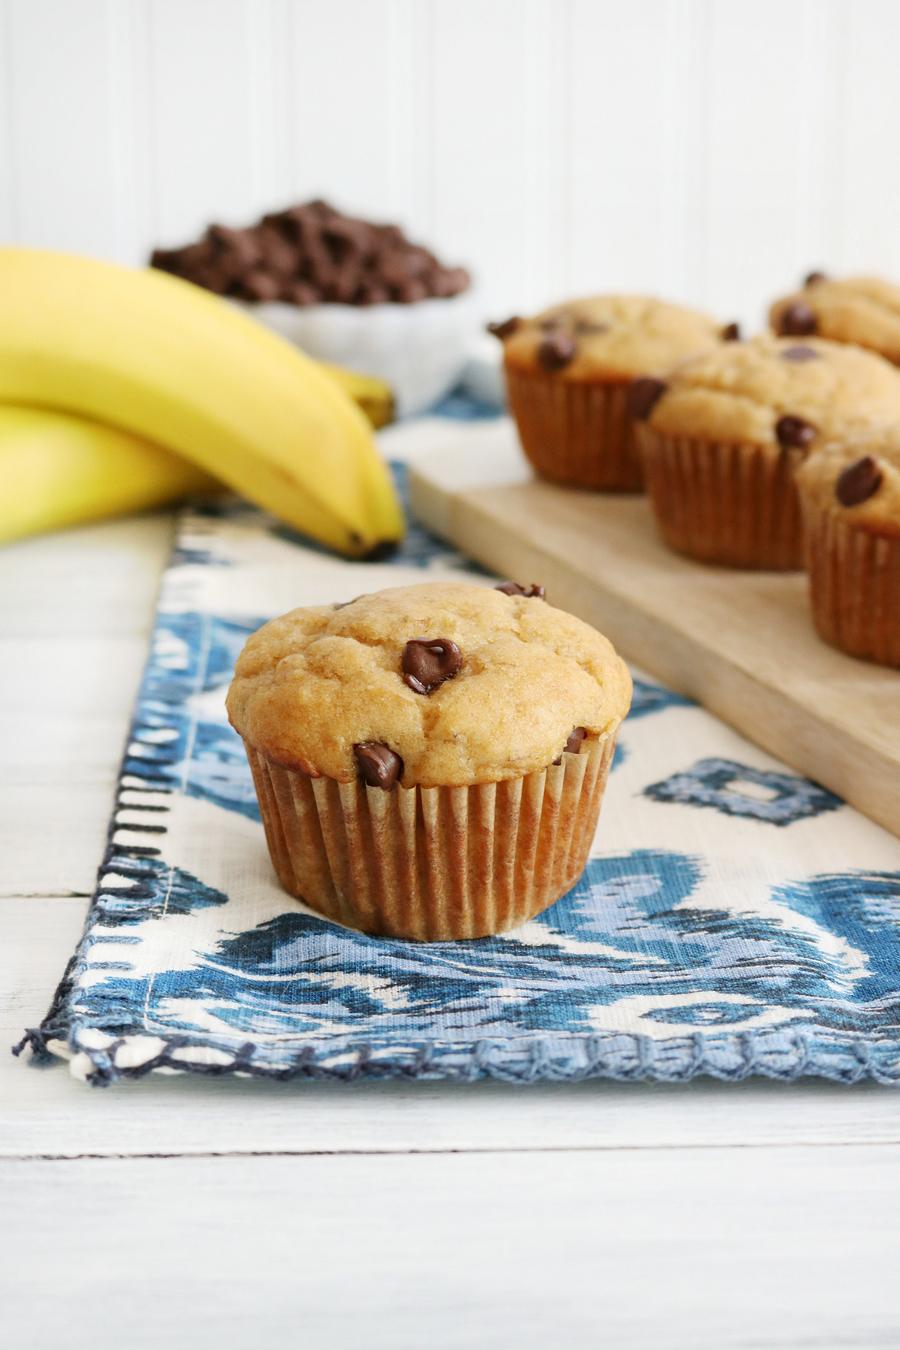 Peanut Butter Banana Yogurt Muffins